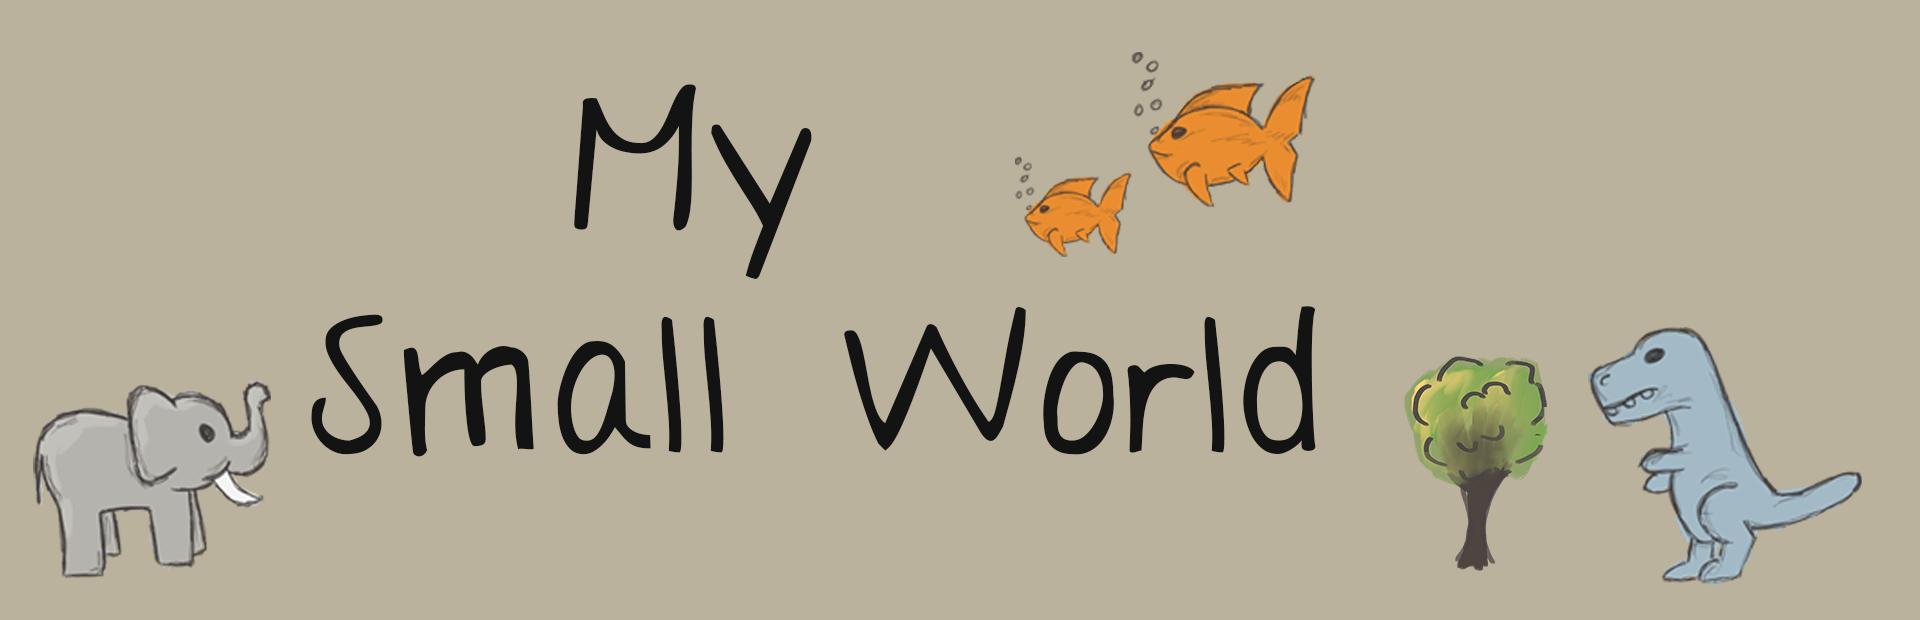 My Small World (VR)